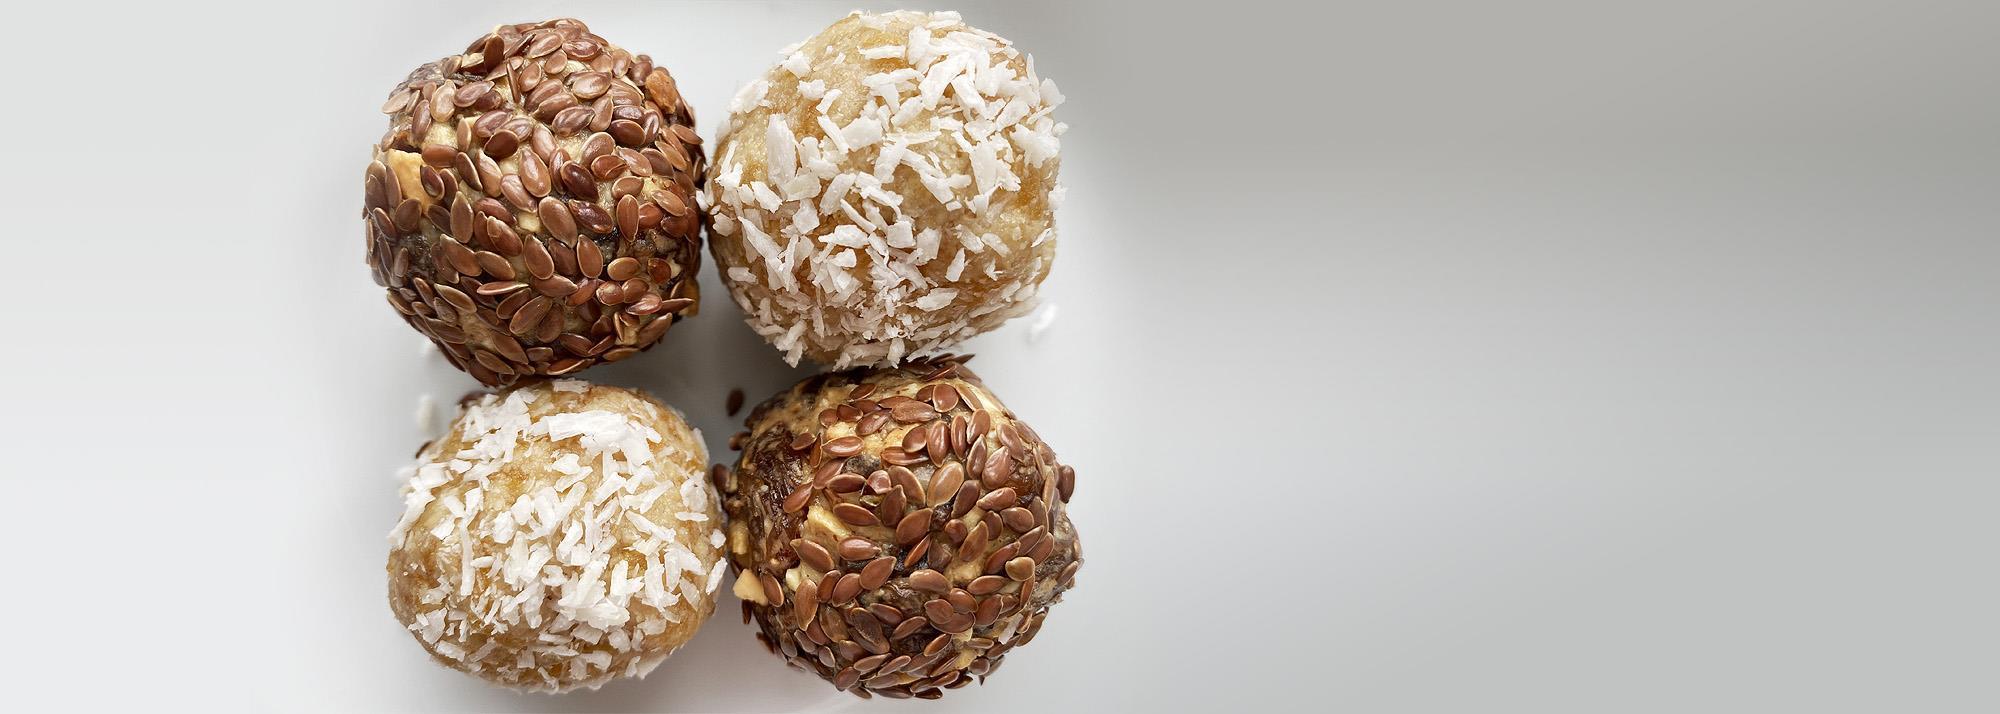 Apricot & almond and cashew & raisin energy balls